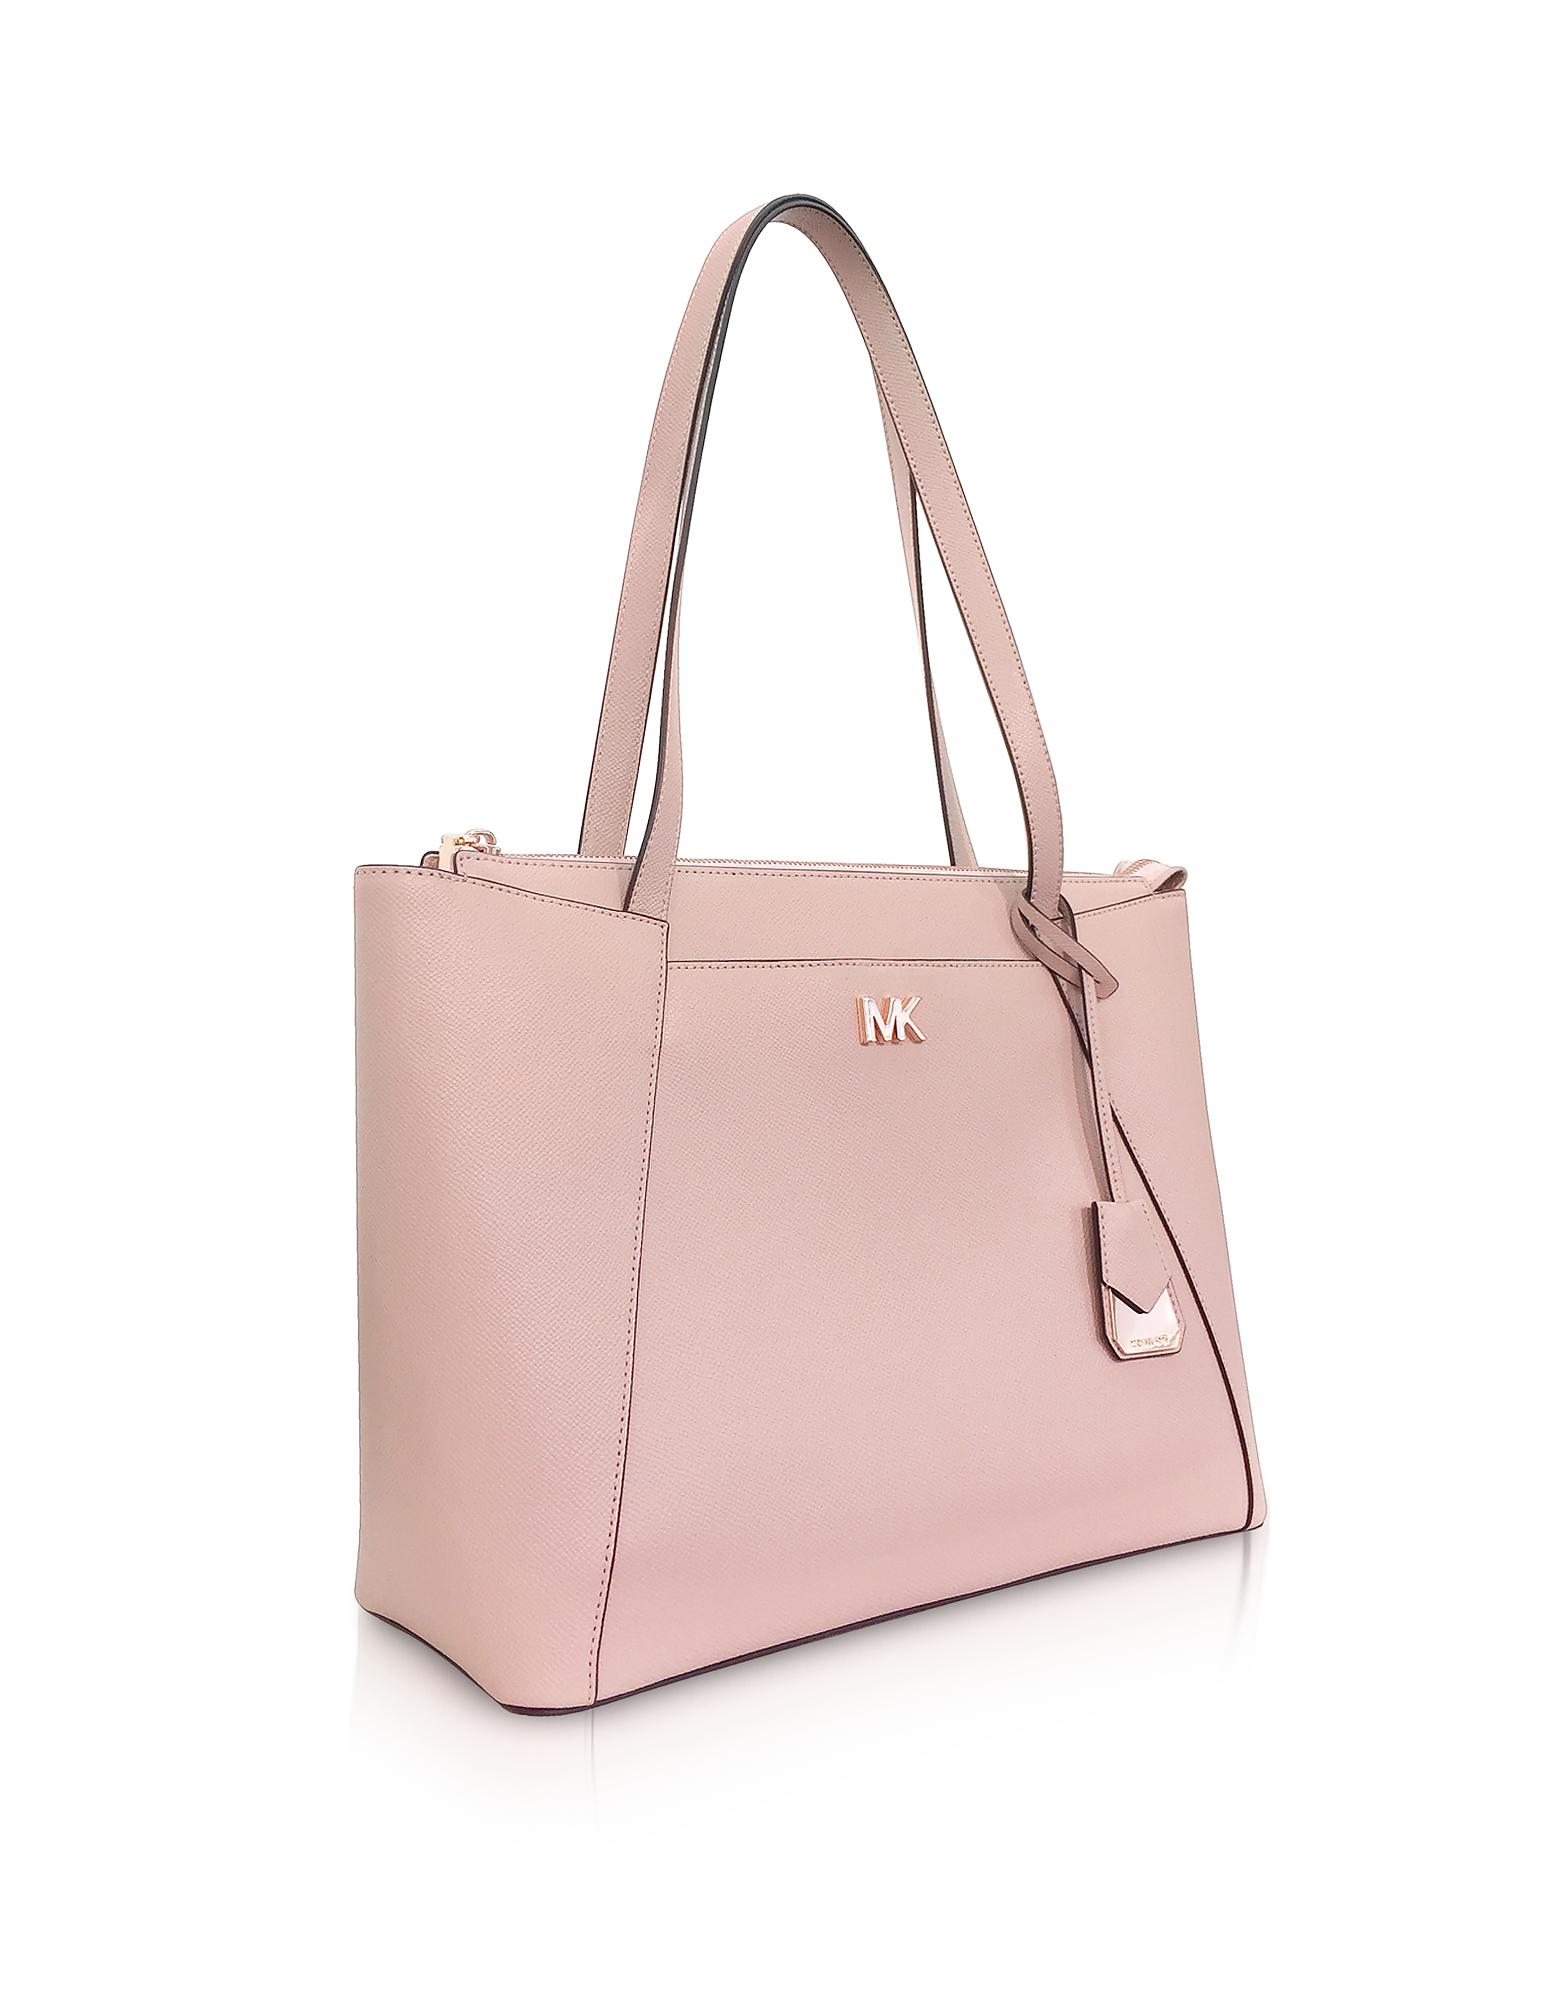 63dca52c0932 Lyst - Michael Kors Soft Pink Maddie Medium Crossgrain Leather Tote ...